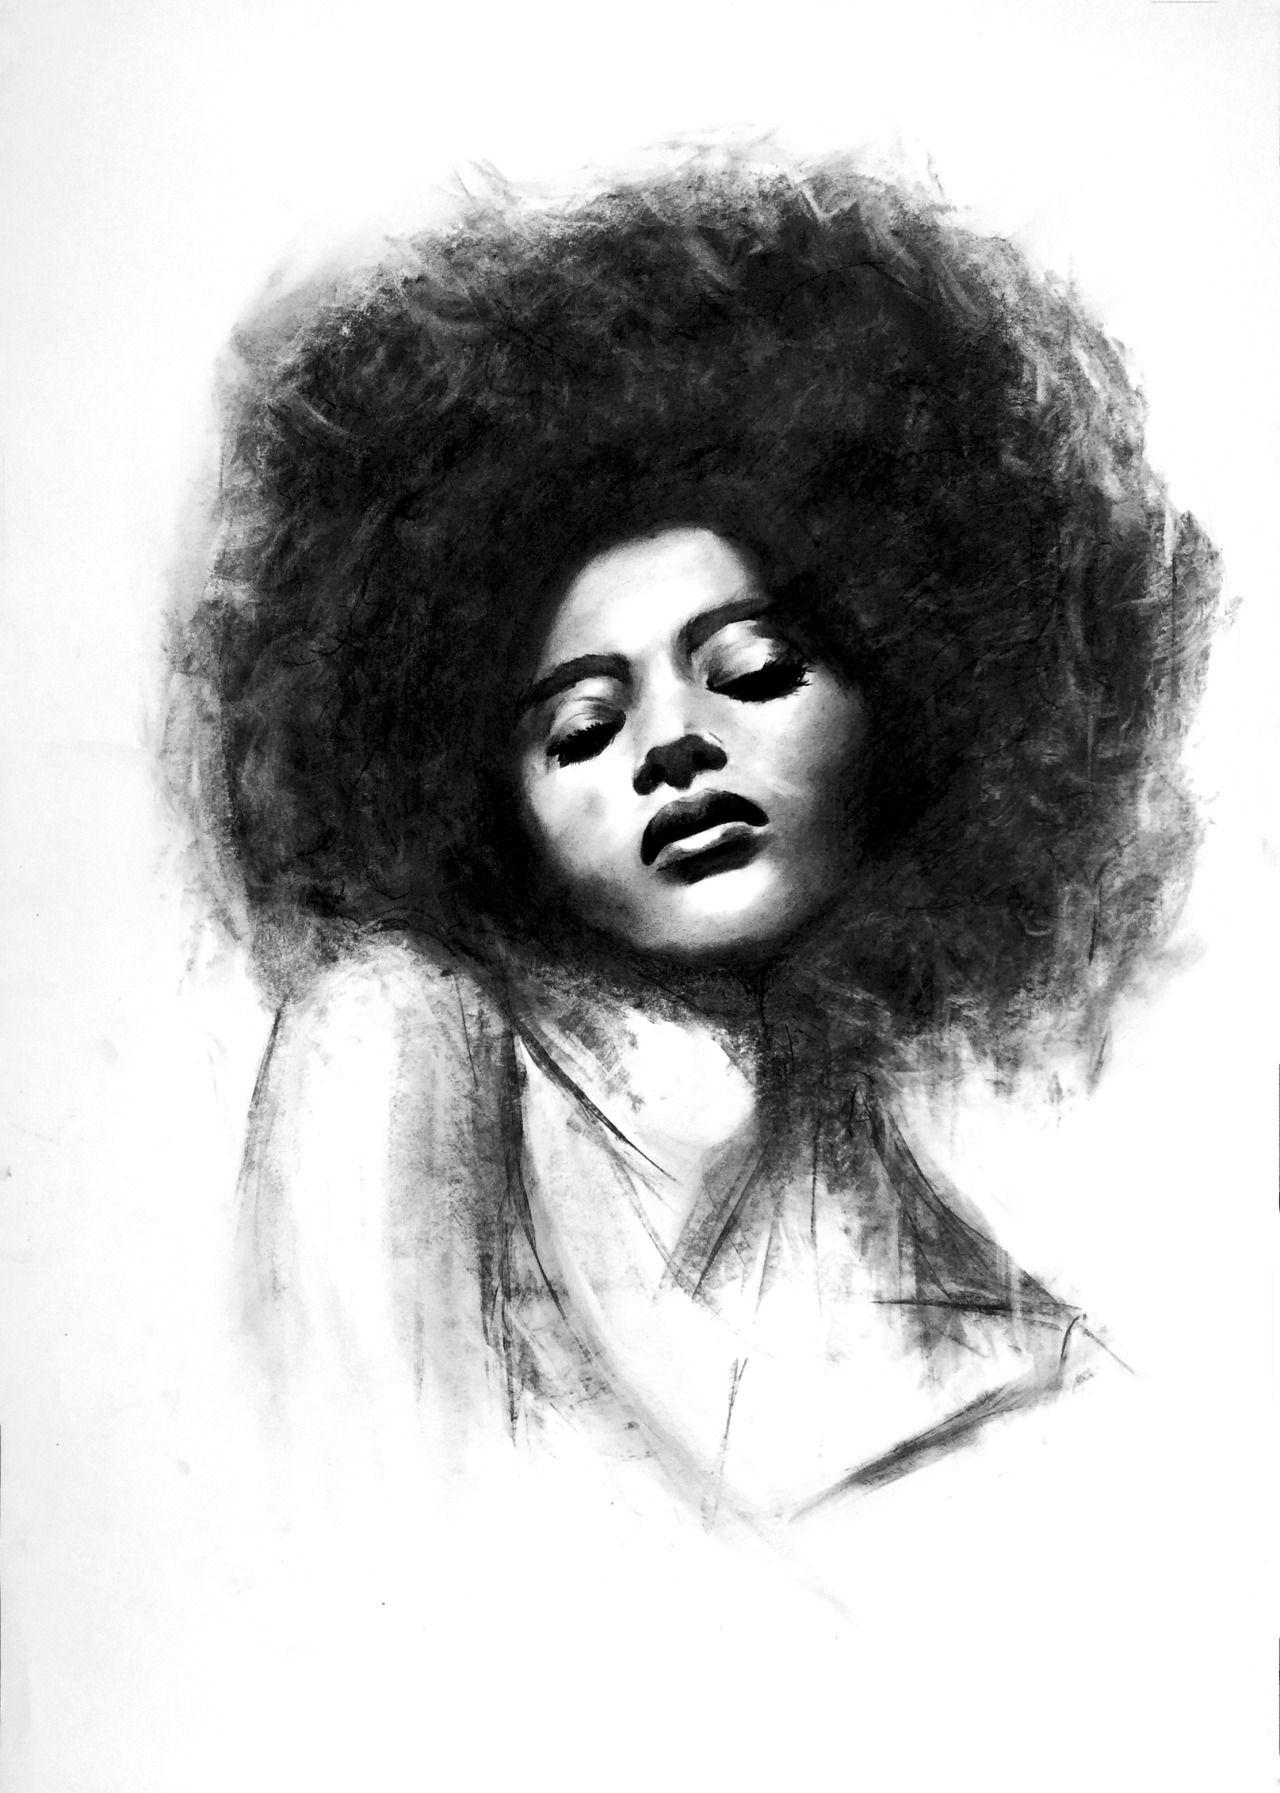 Afro girl. Charcoal piece by Denny Stoekenbroek … | Arte y P…